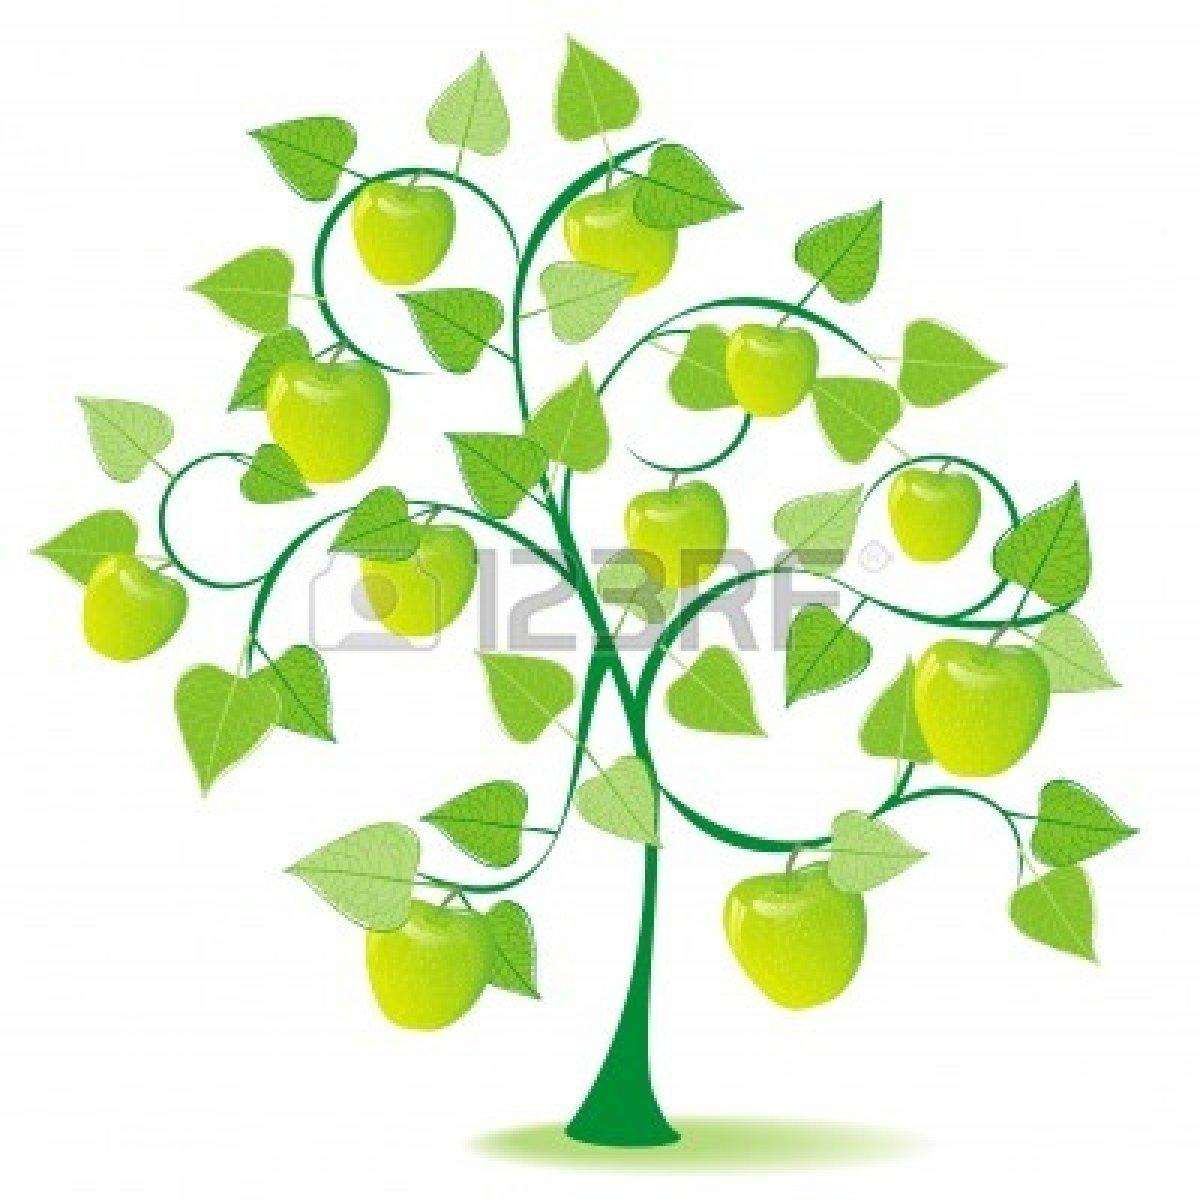 Season clipart apple tree #7